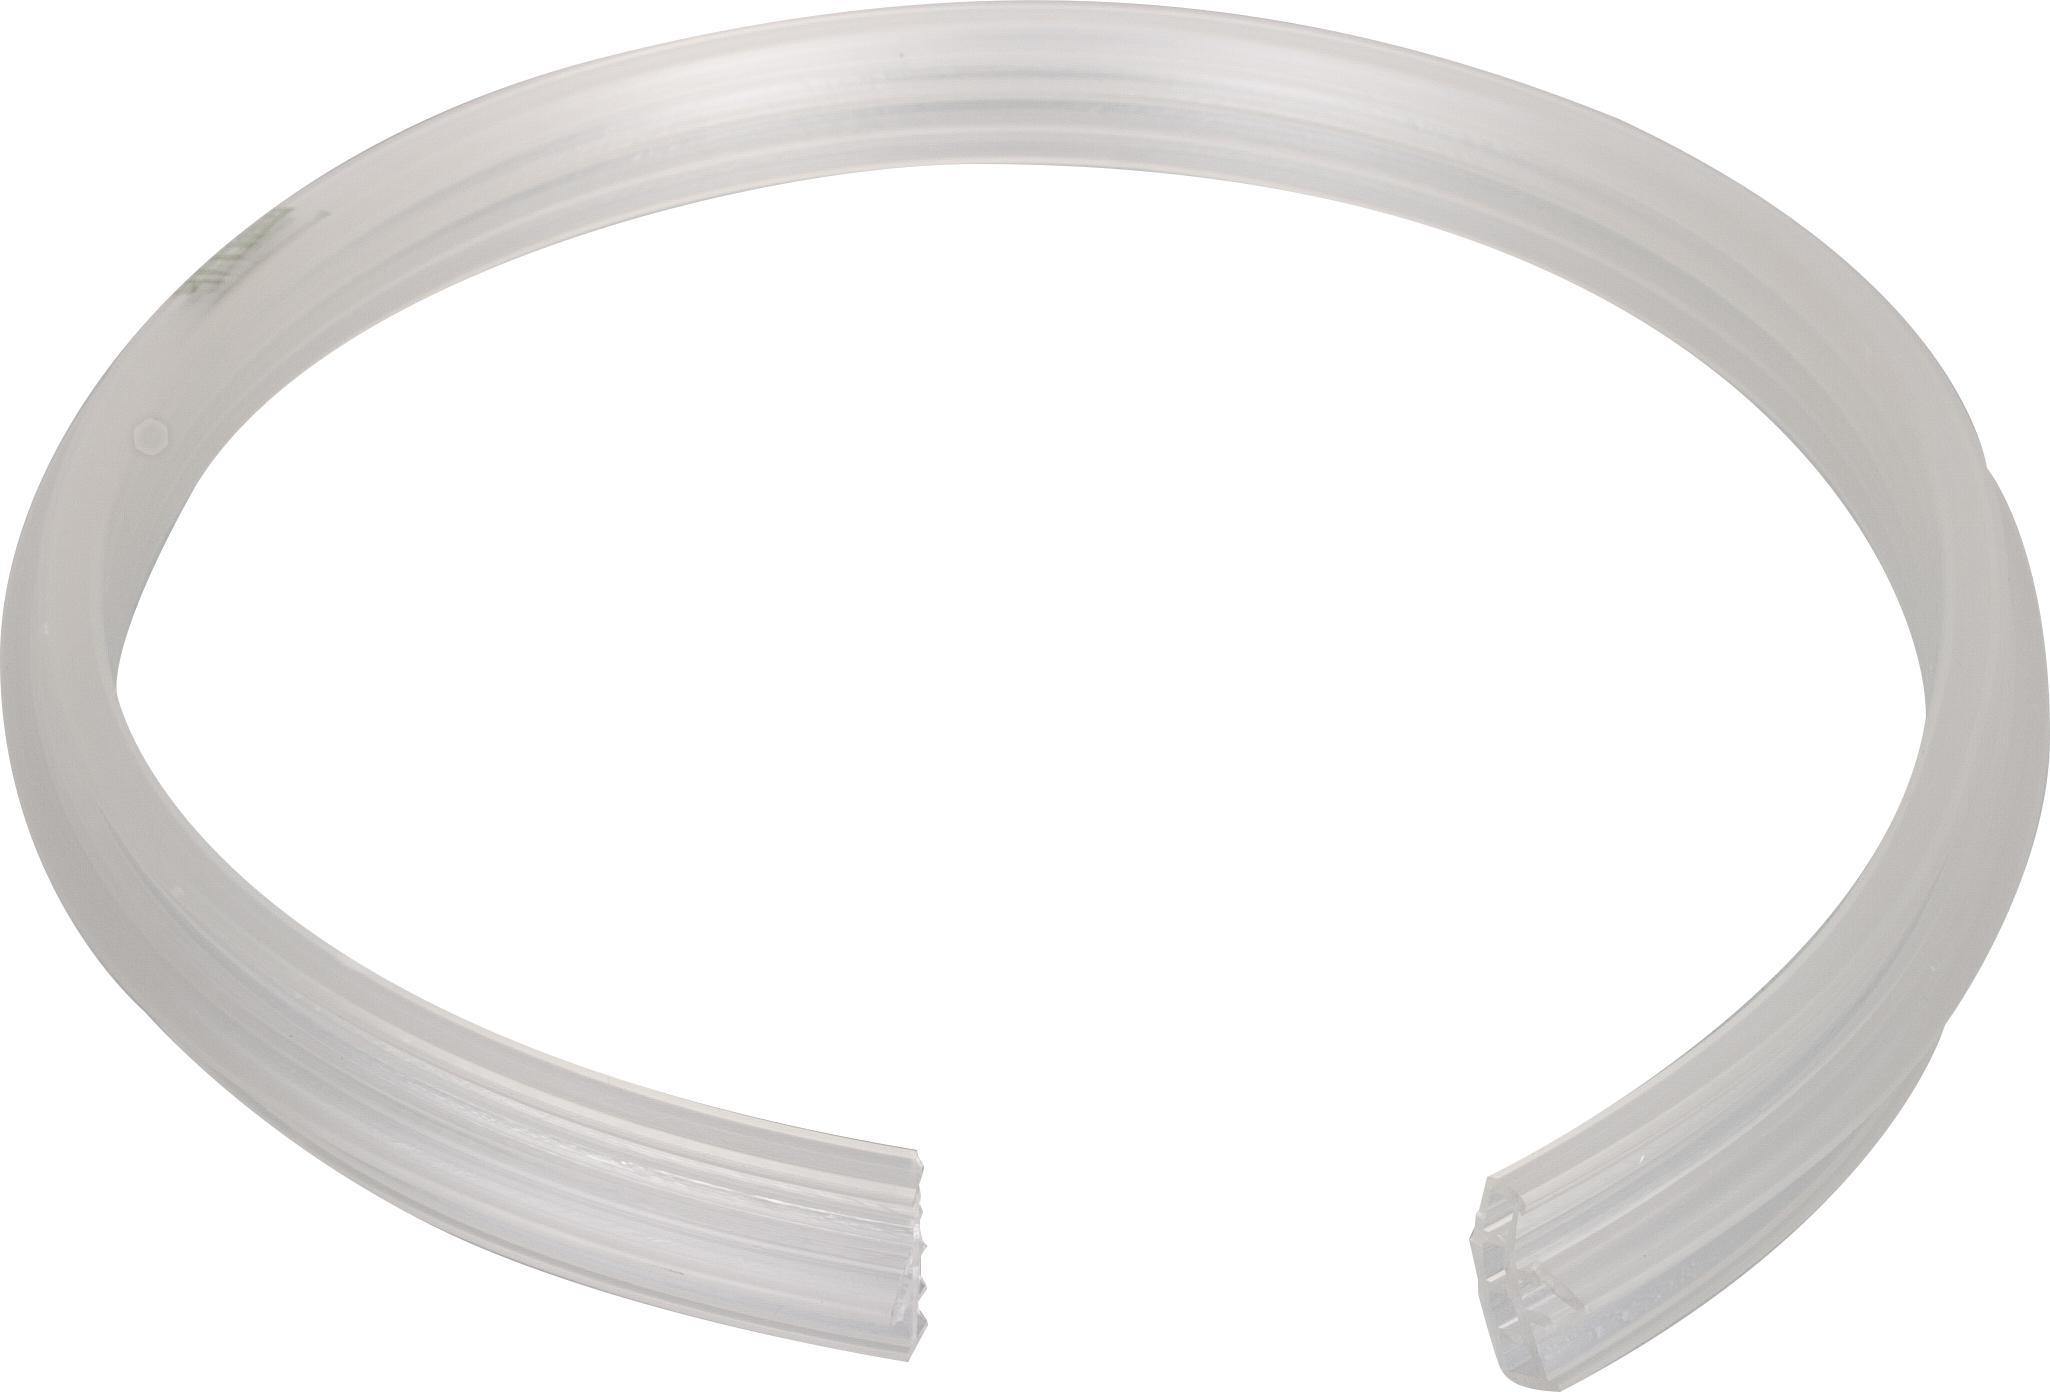 Profilgummi für Stahlrohrsackkarre verzinkt